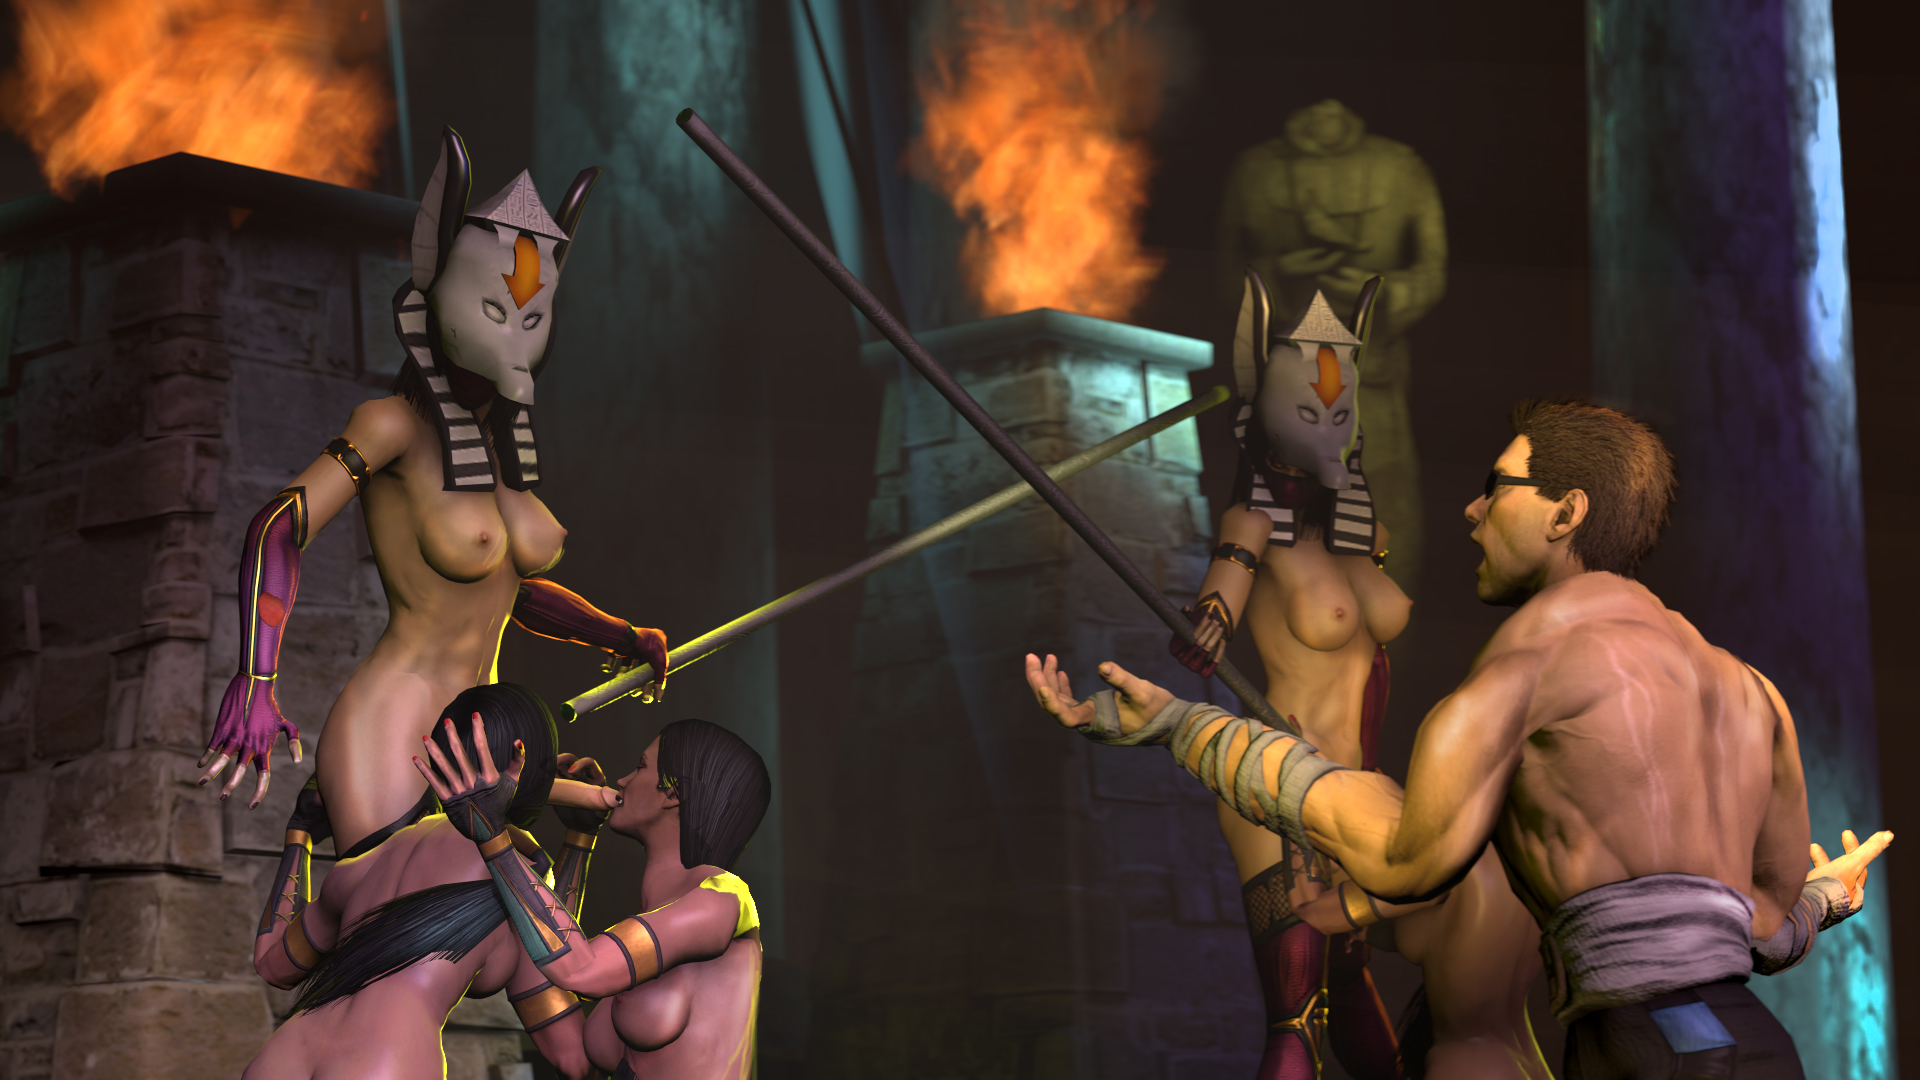 Секс мортал комбат пародия, Mortal Kombat xxx 3D Пародия. Джейд, Китана, Милена 1 фотография